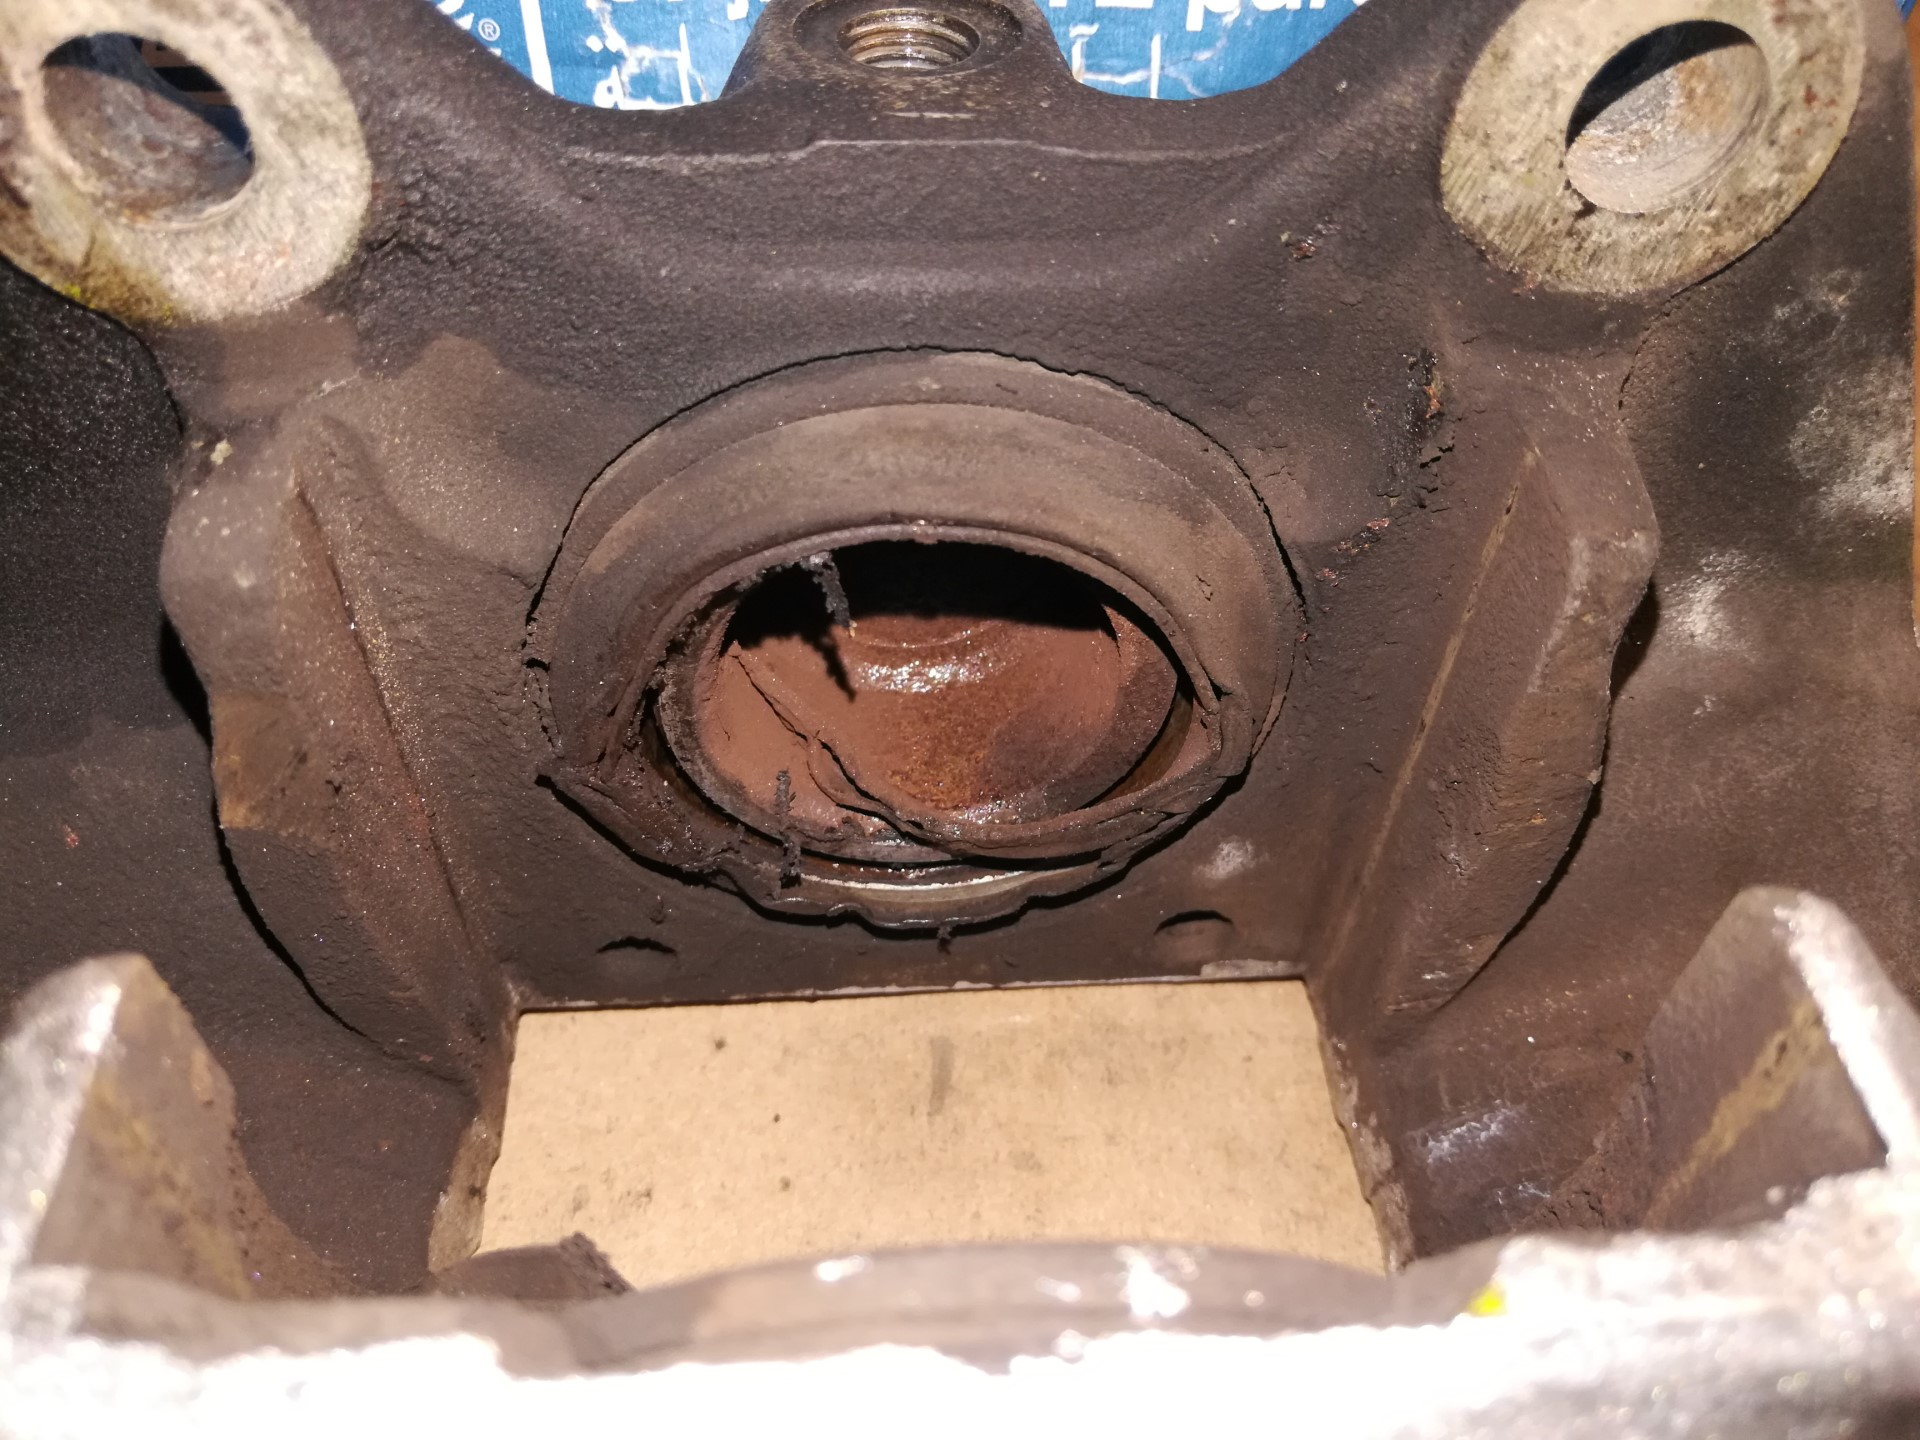 Air-cooled Porsche 911 front caliper piston seal damage